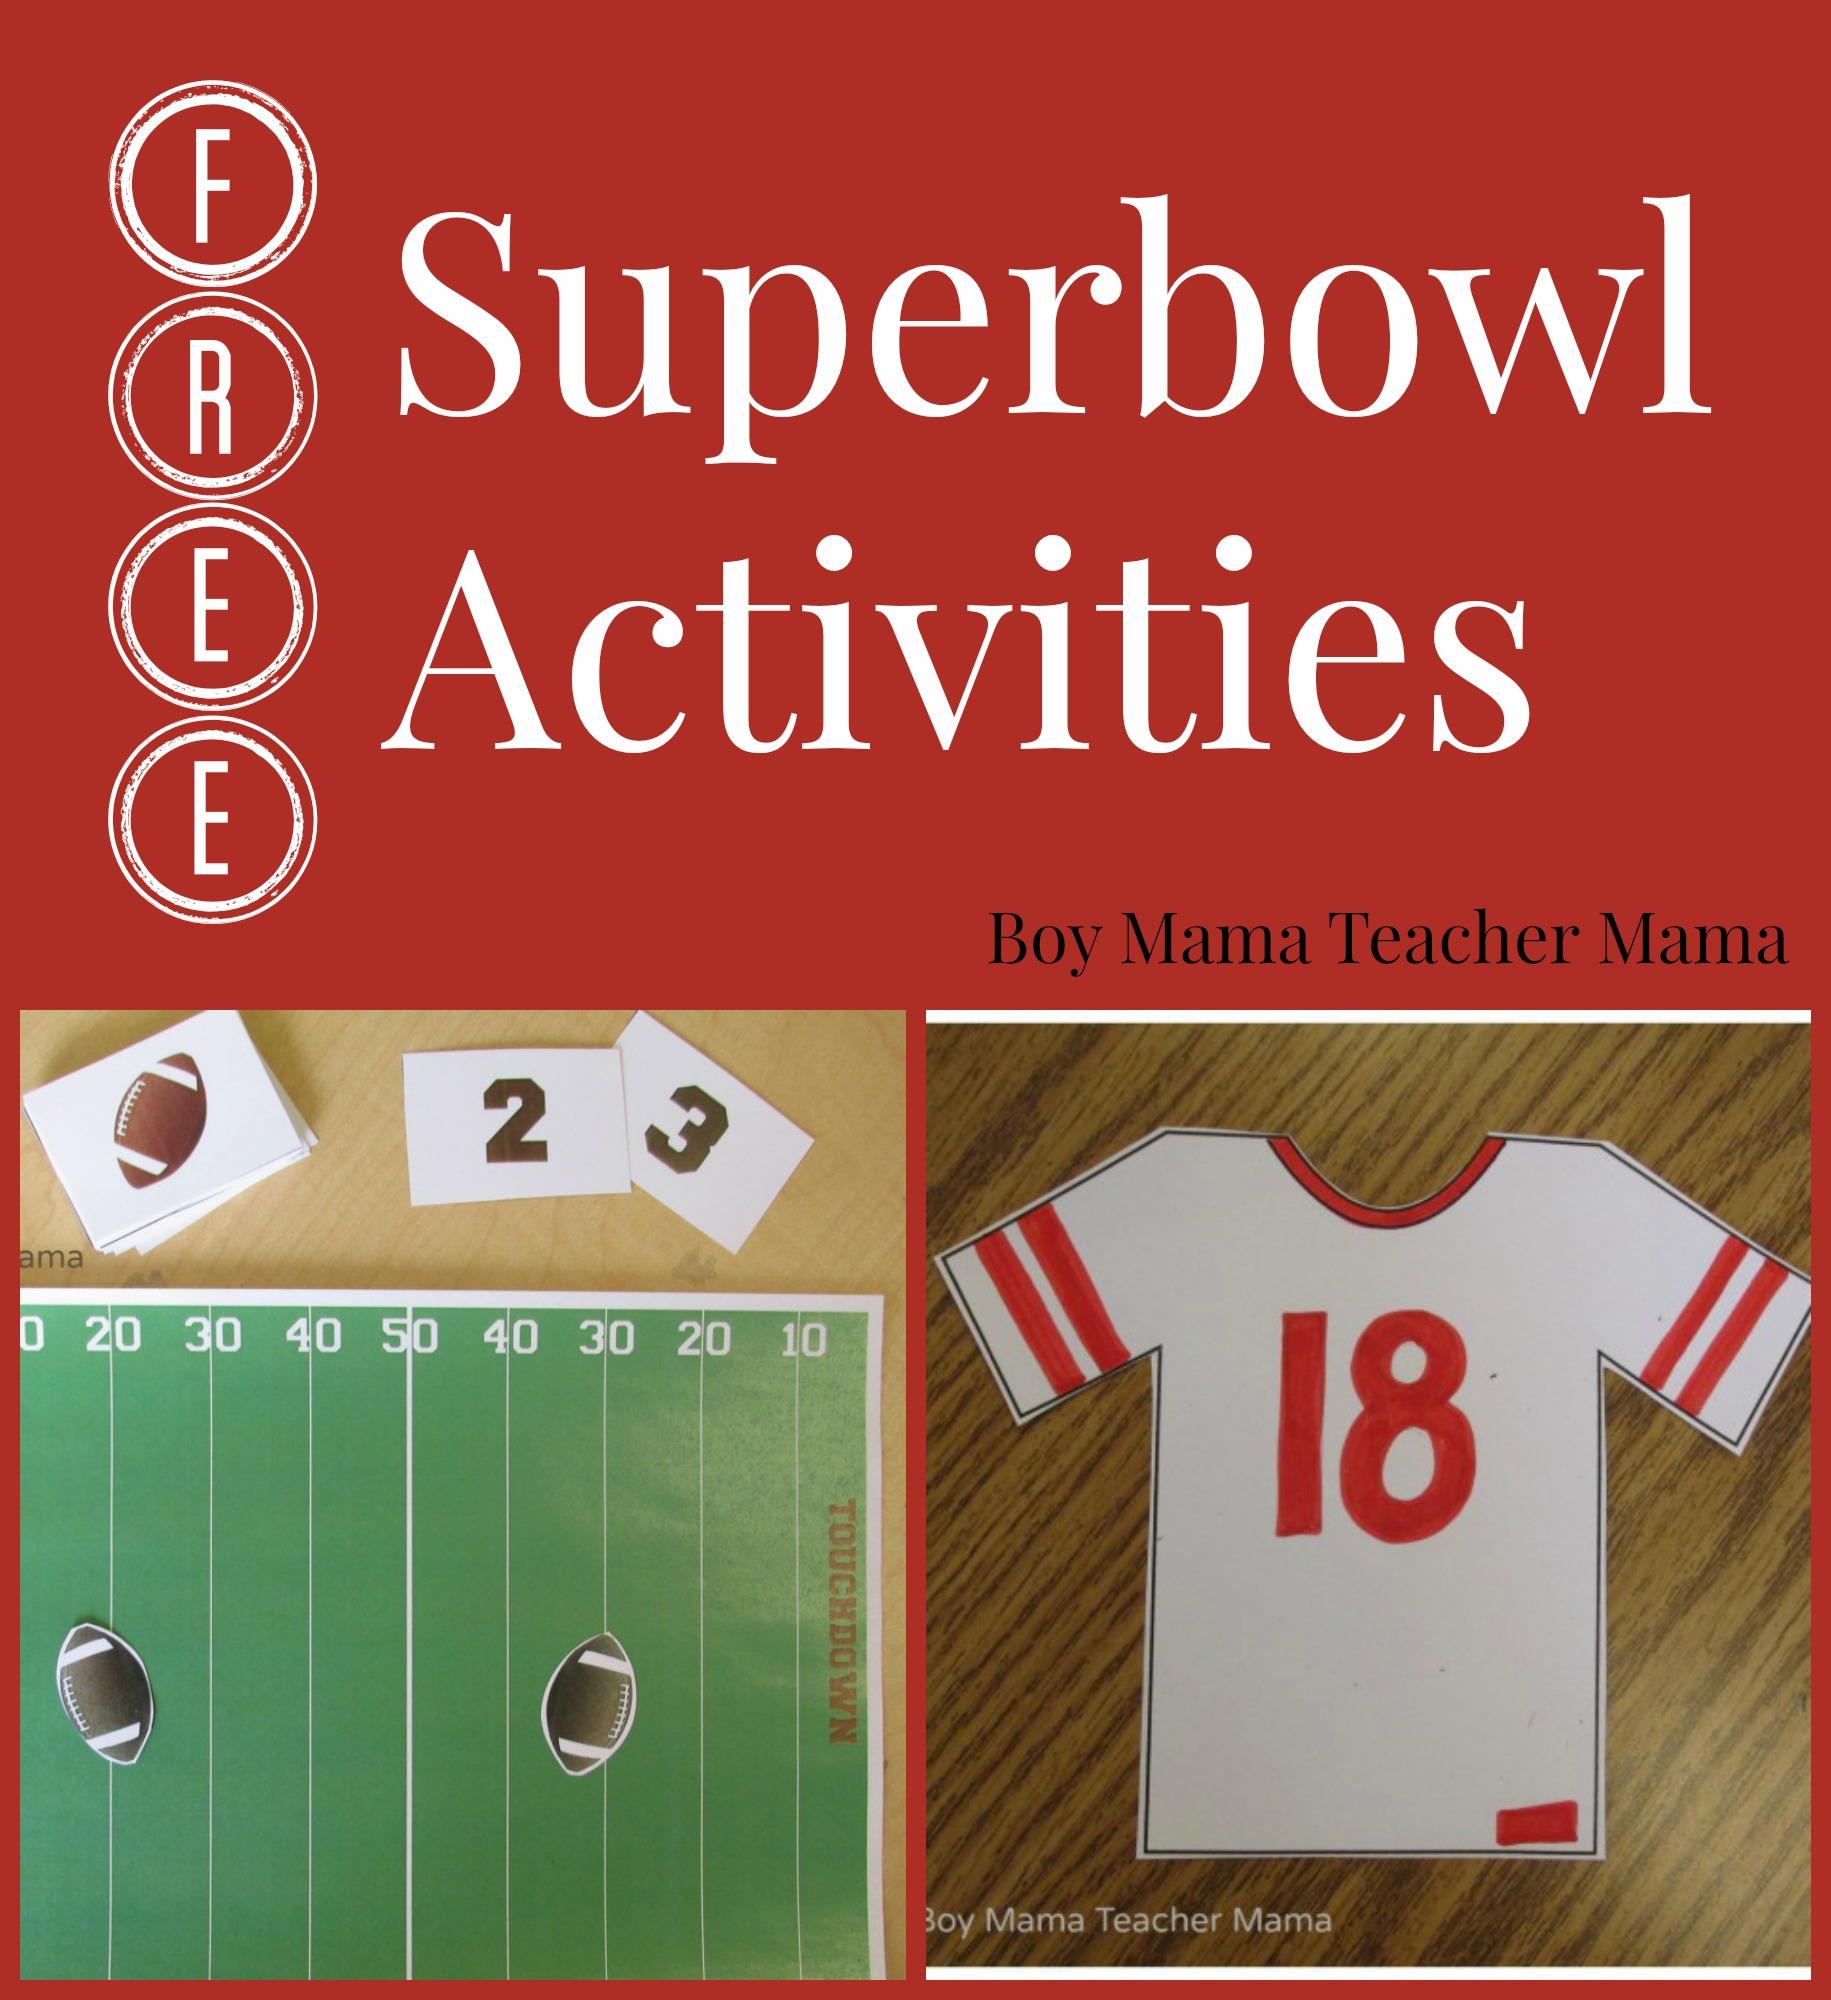 Boy Mama Teacher Mama FREE Superbowl Activities